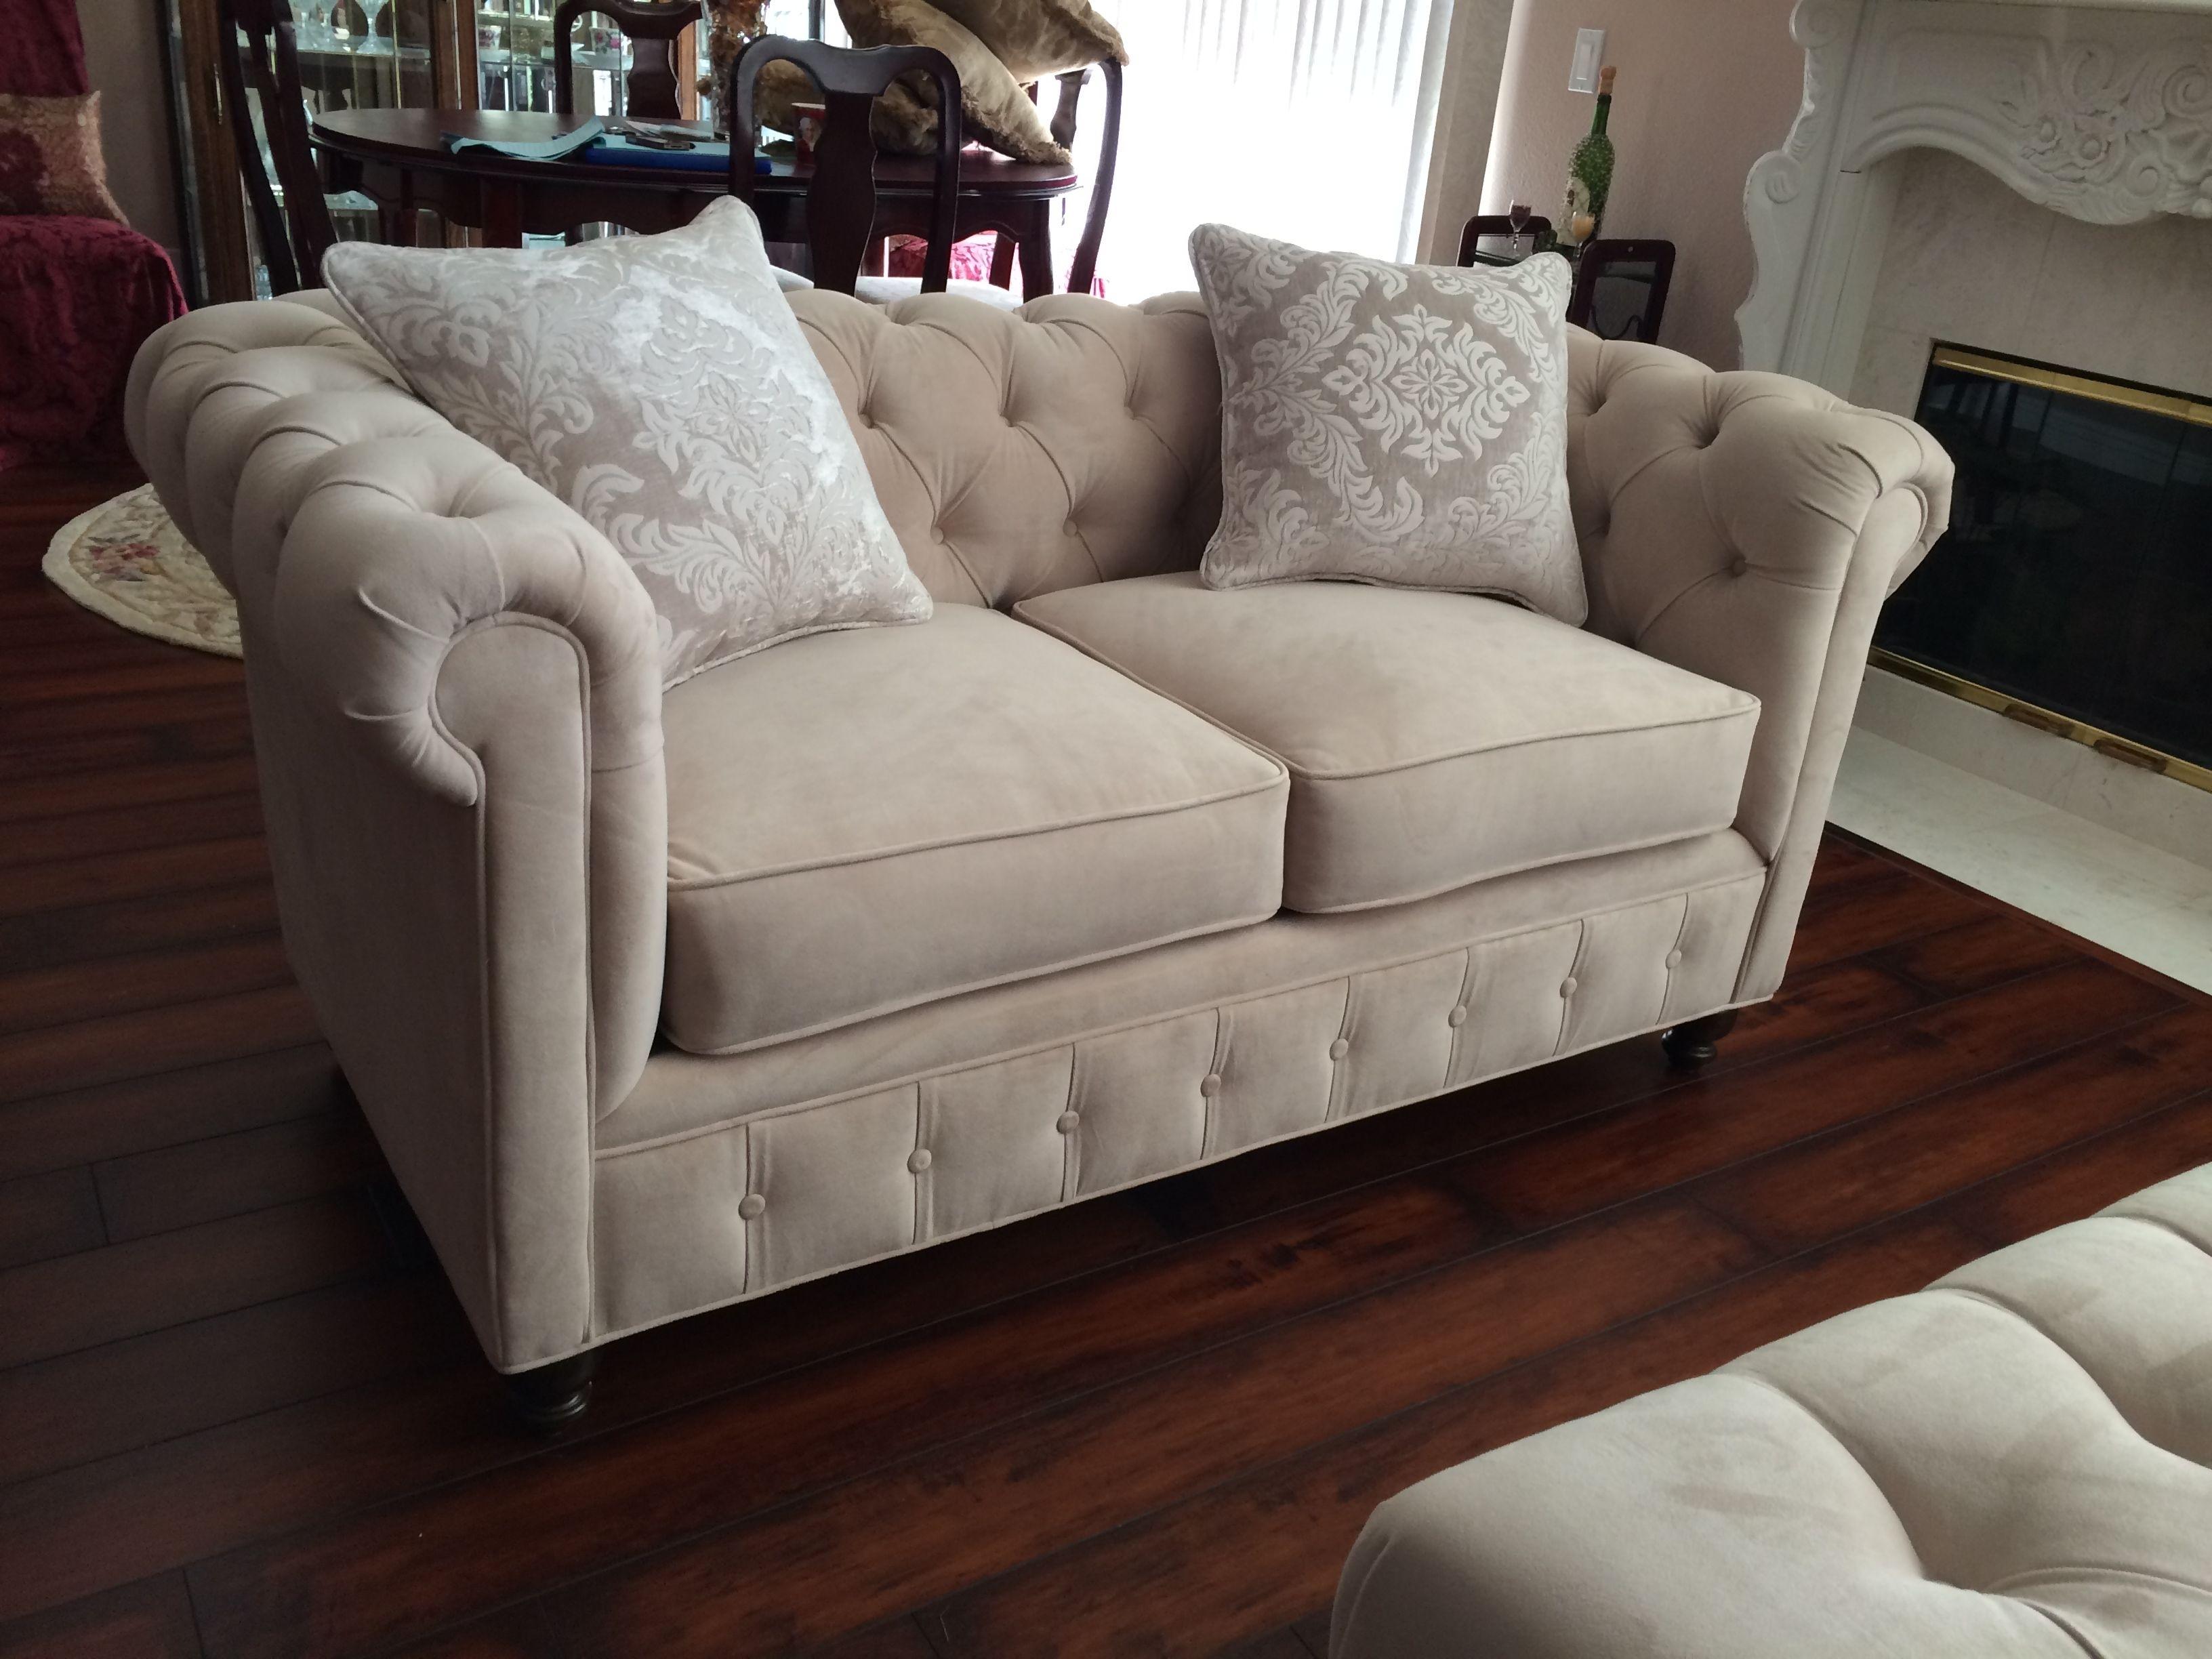 Pinmonarch Sofas - Your Custom Sofa & Custom Sectional Source inside Houzz Sectional Sofas (Image 10 of 10)